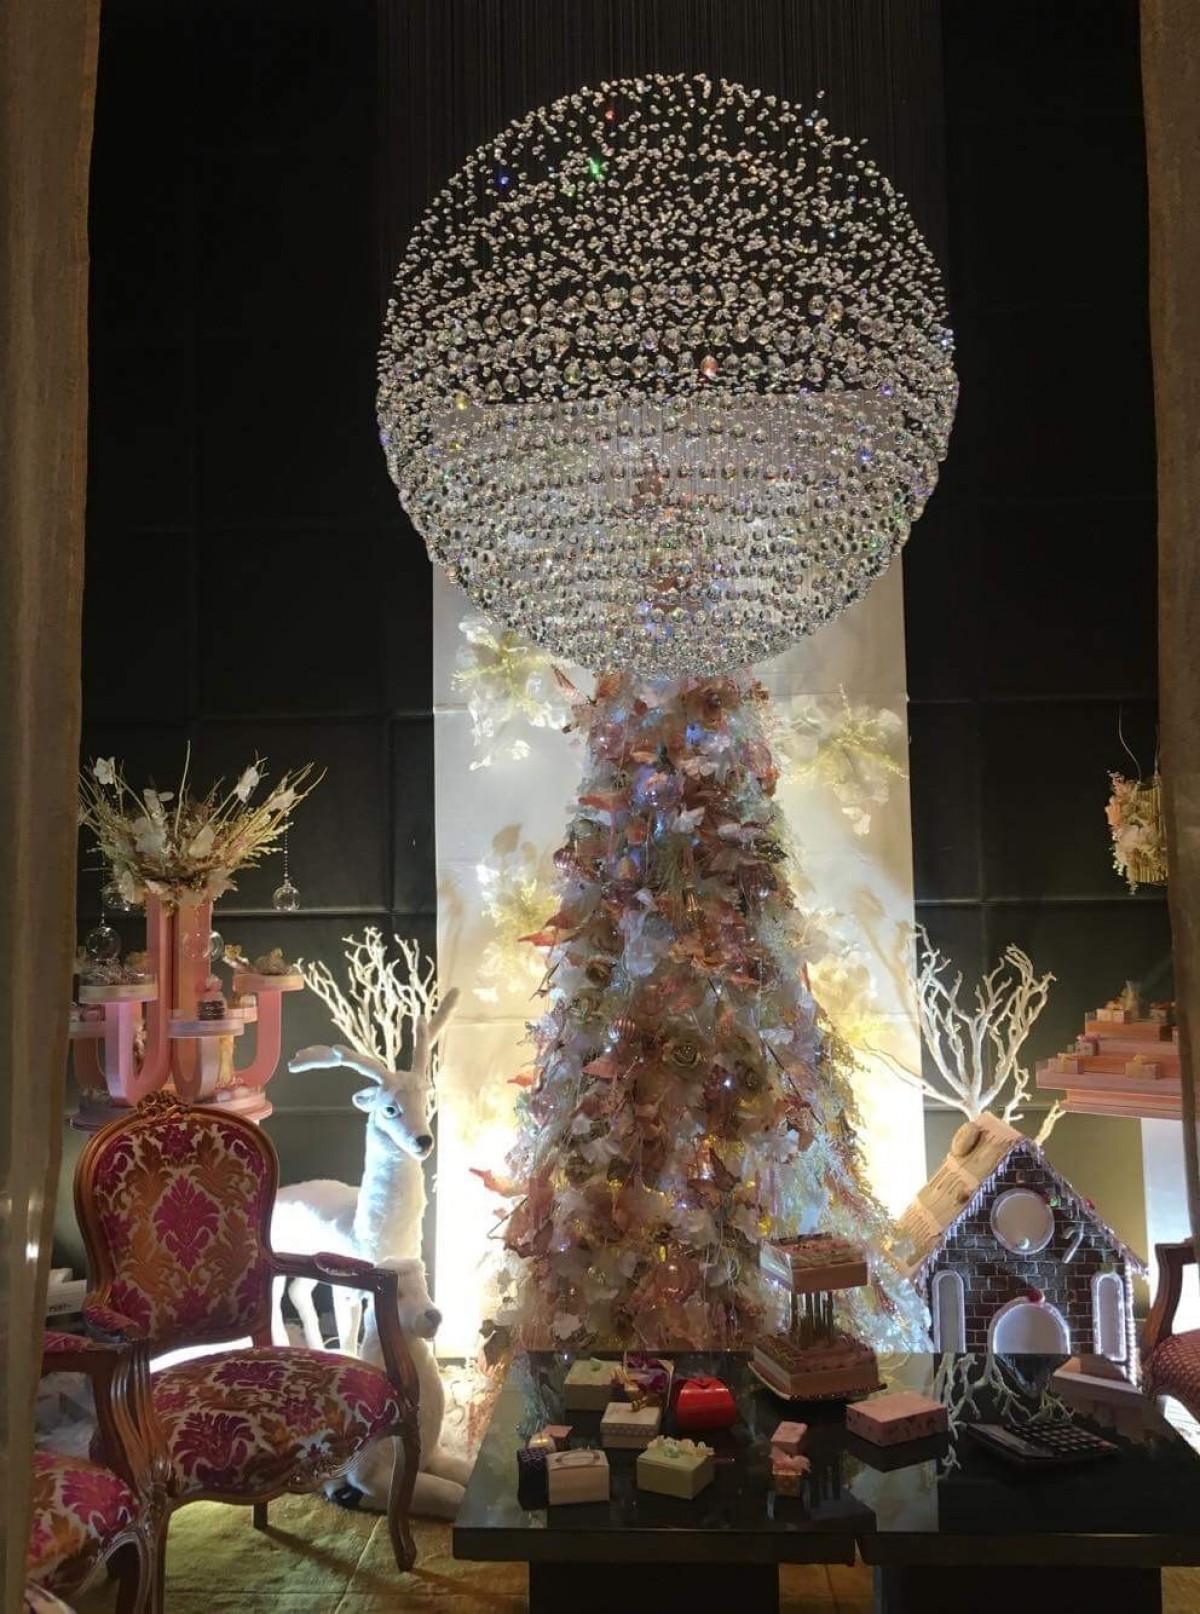 Around the world with Unique Eastates - Ilonka Stoyanova in Dubai.